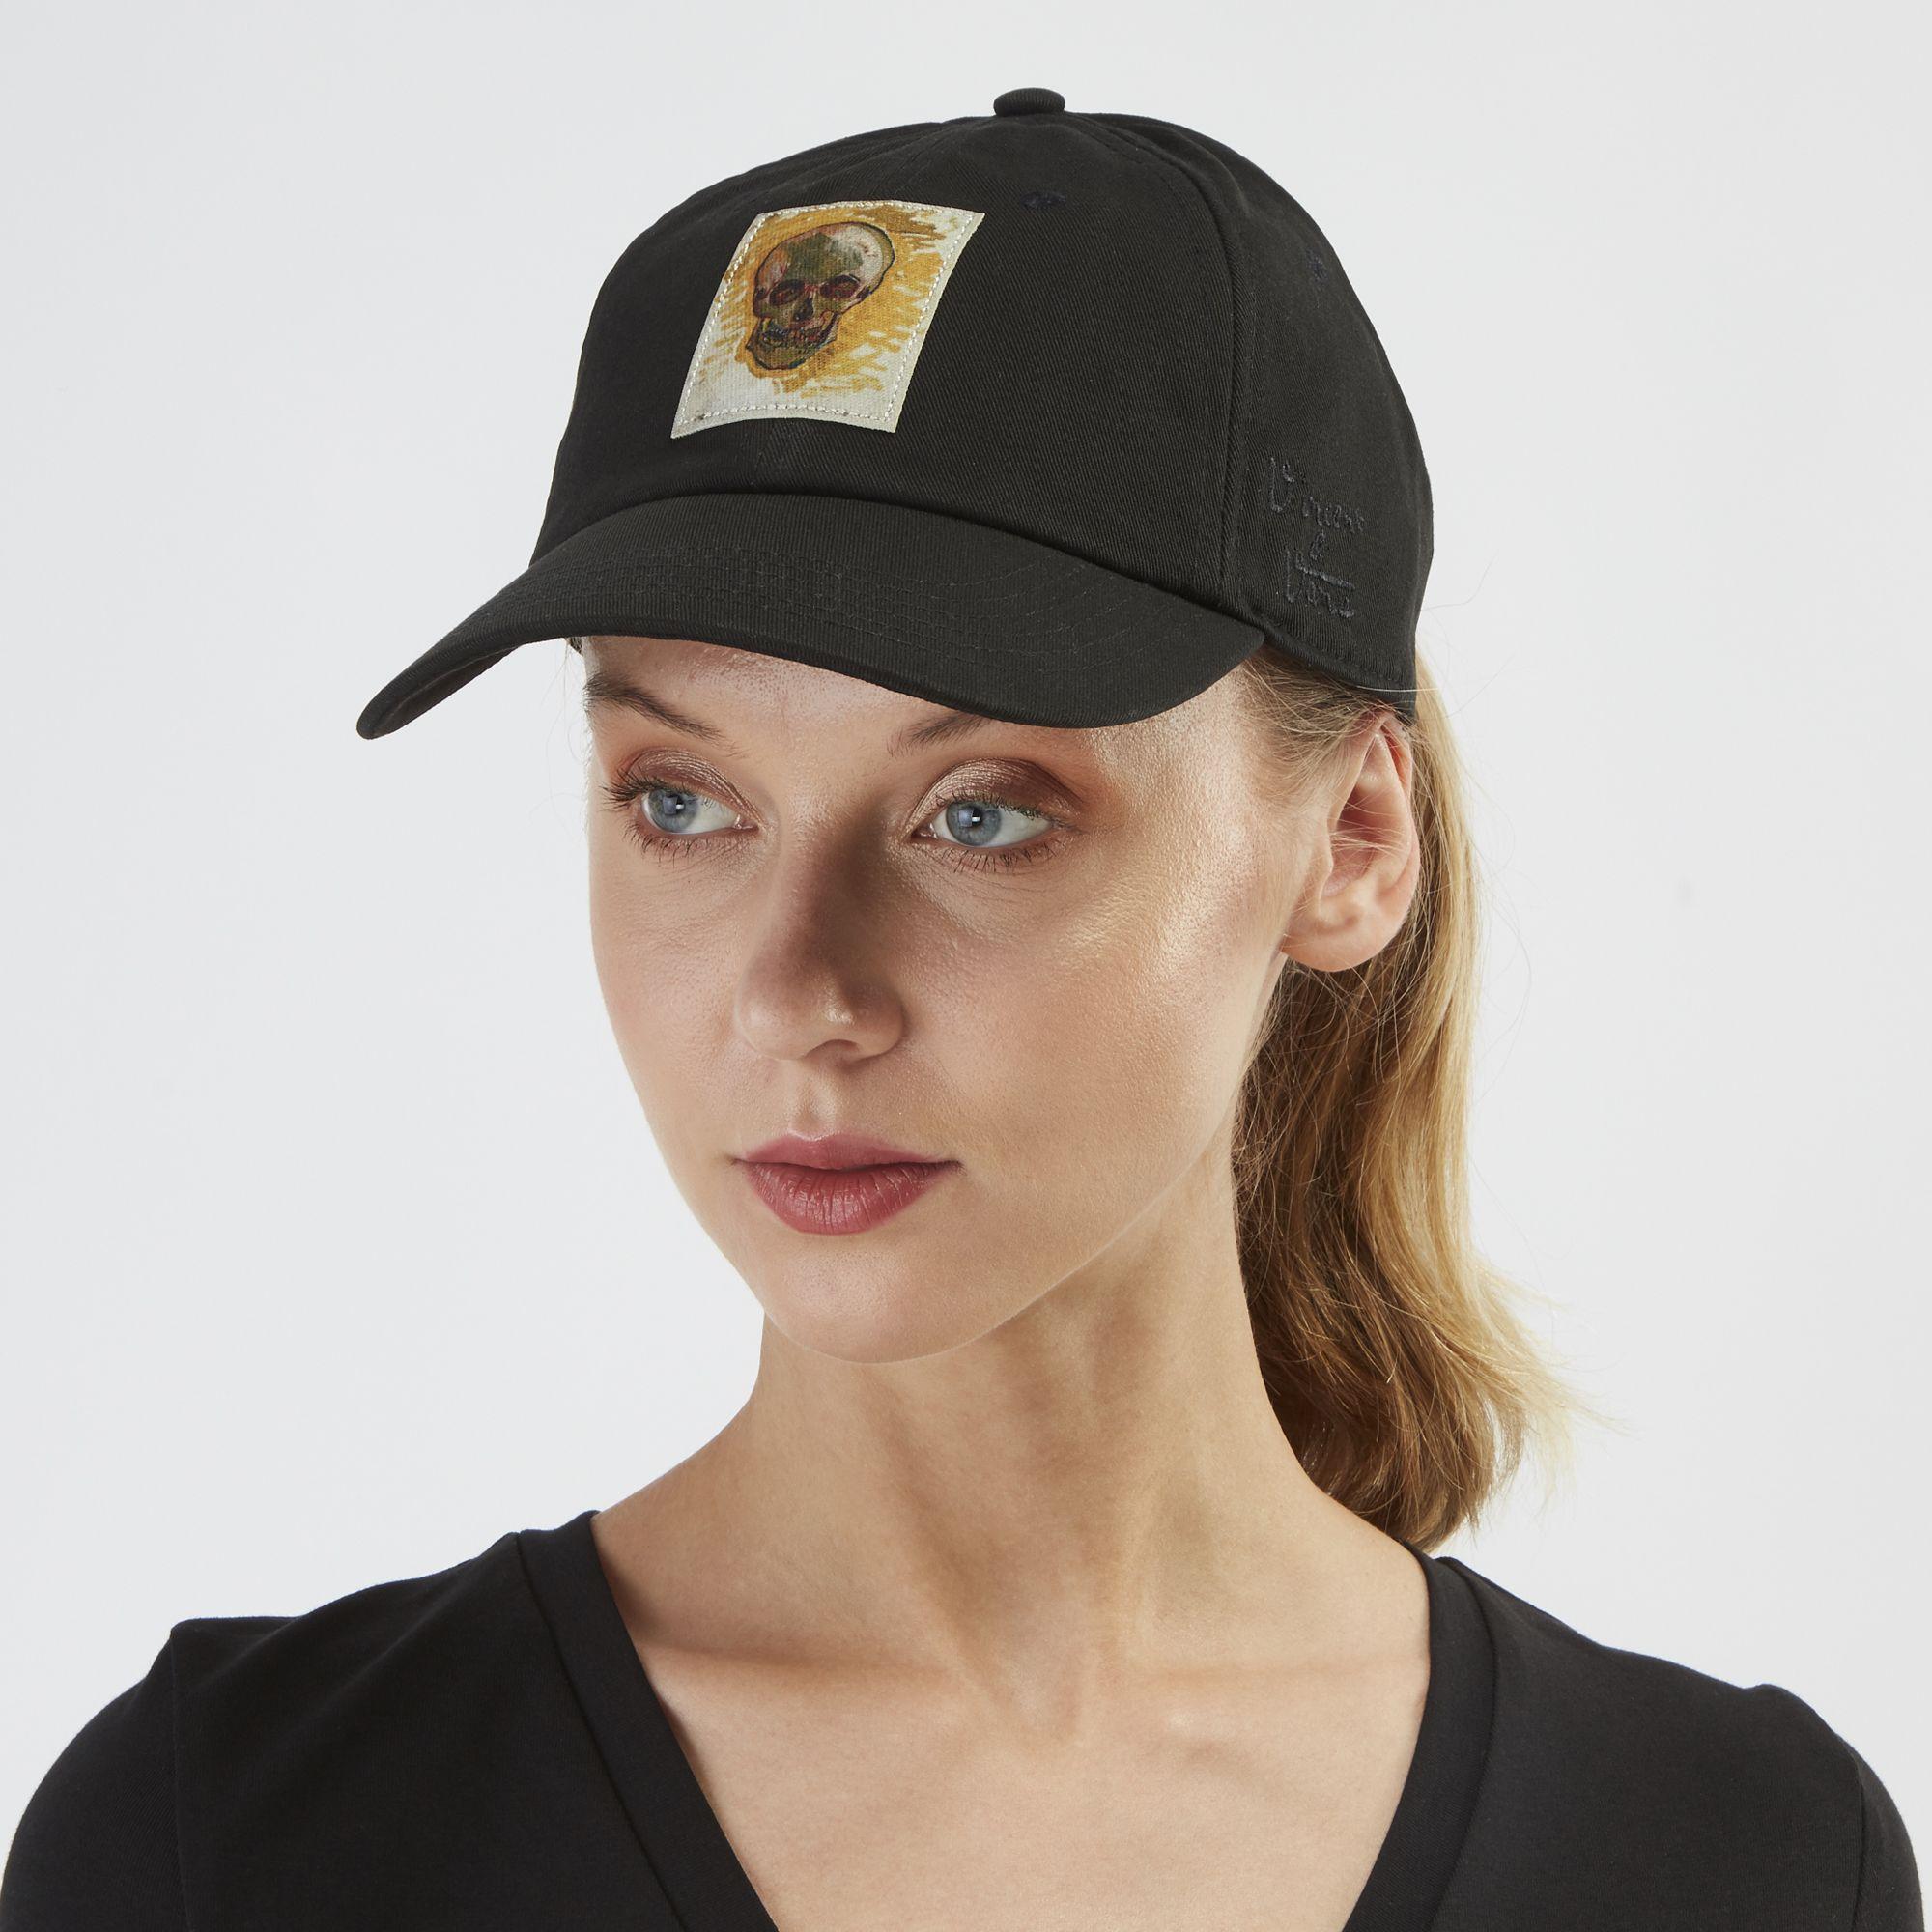 Vans X Van Gogh Museum Skull Cap Caps Caps Hats Accessories Womens Sss